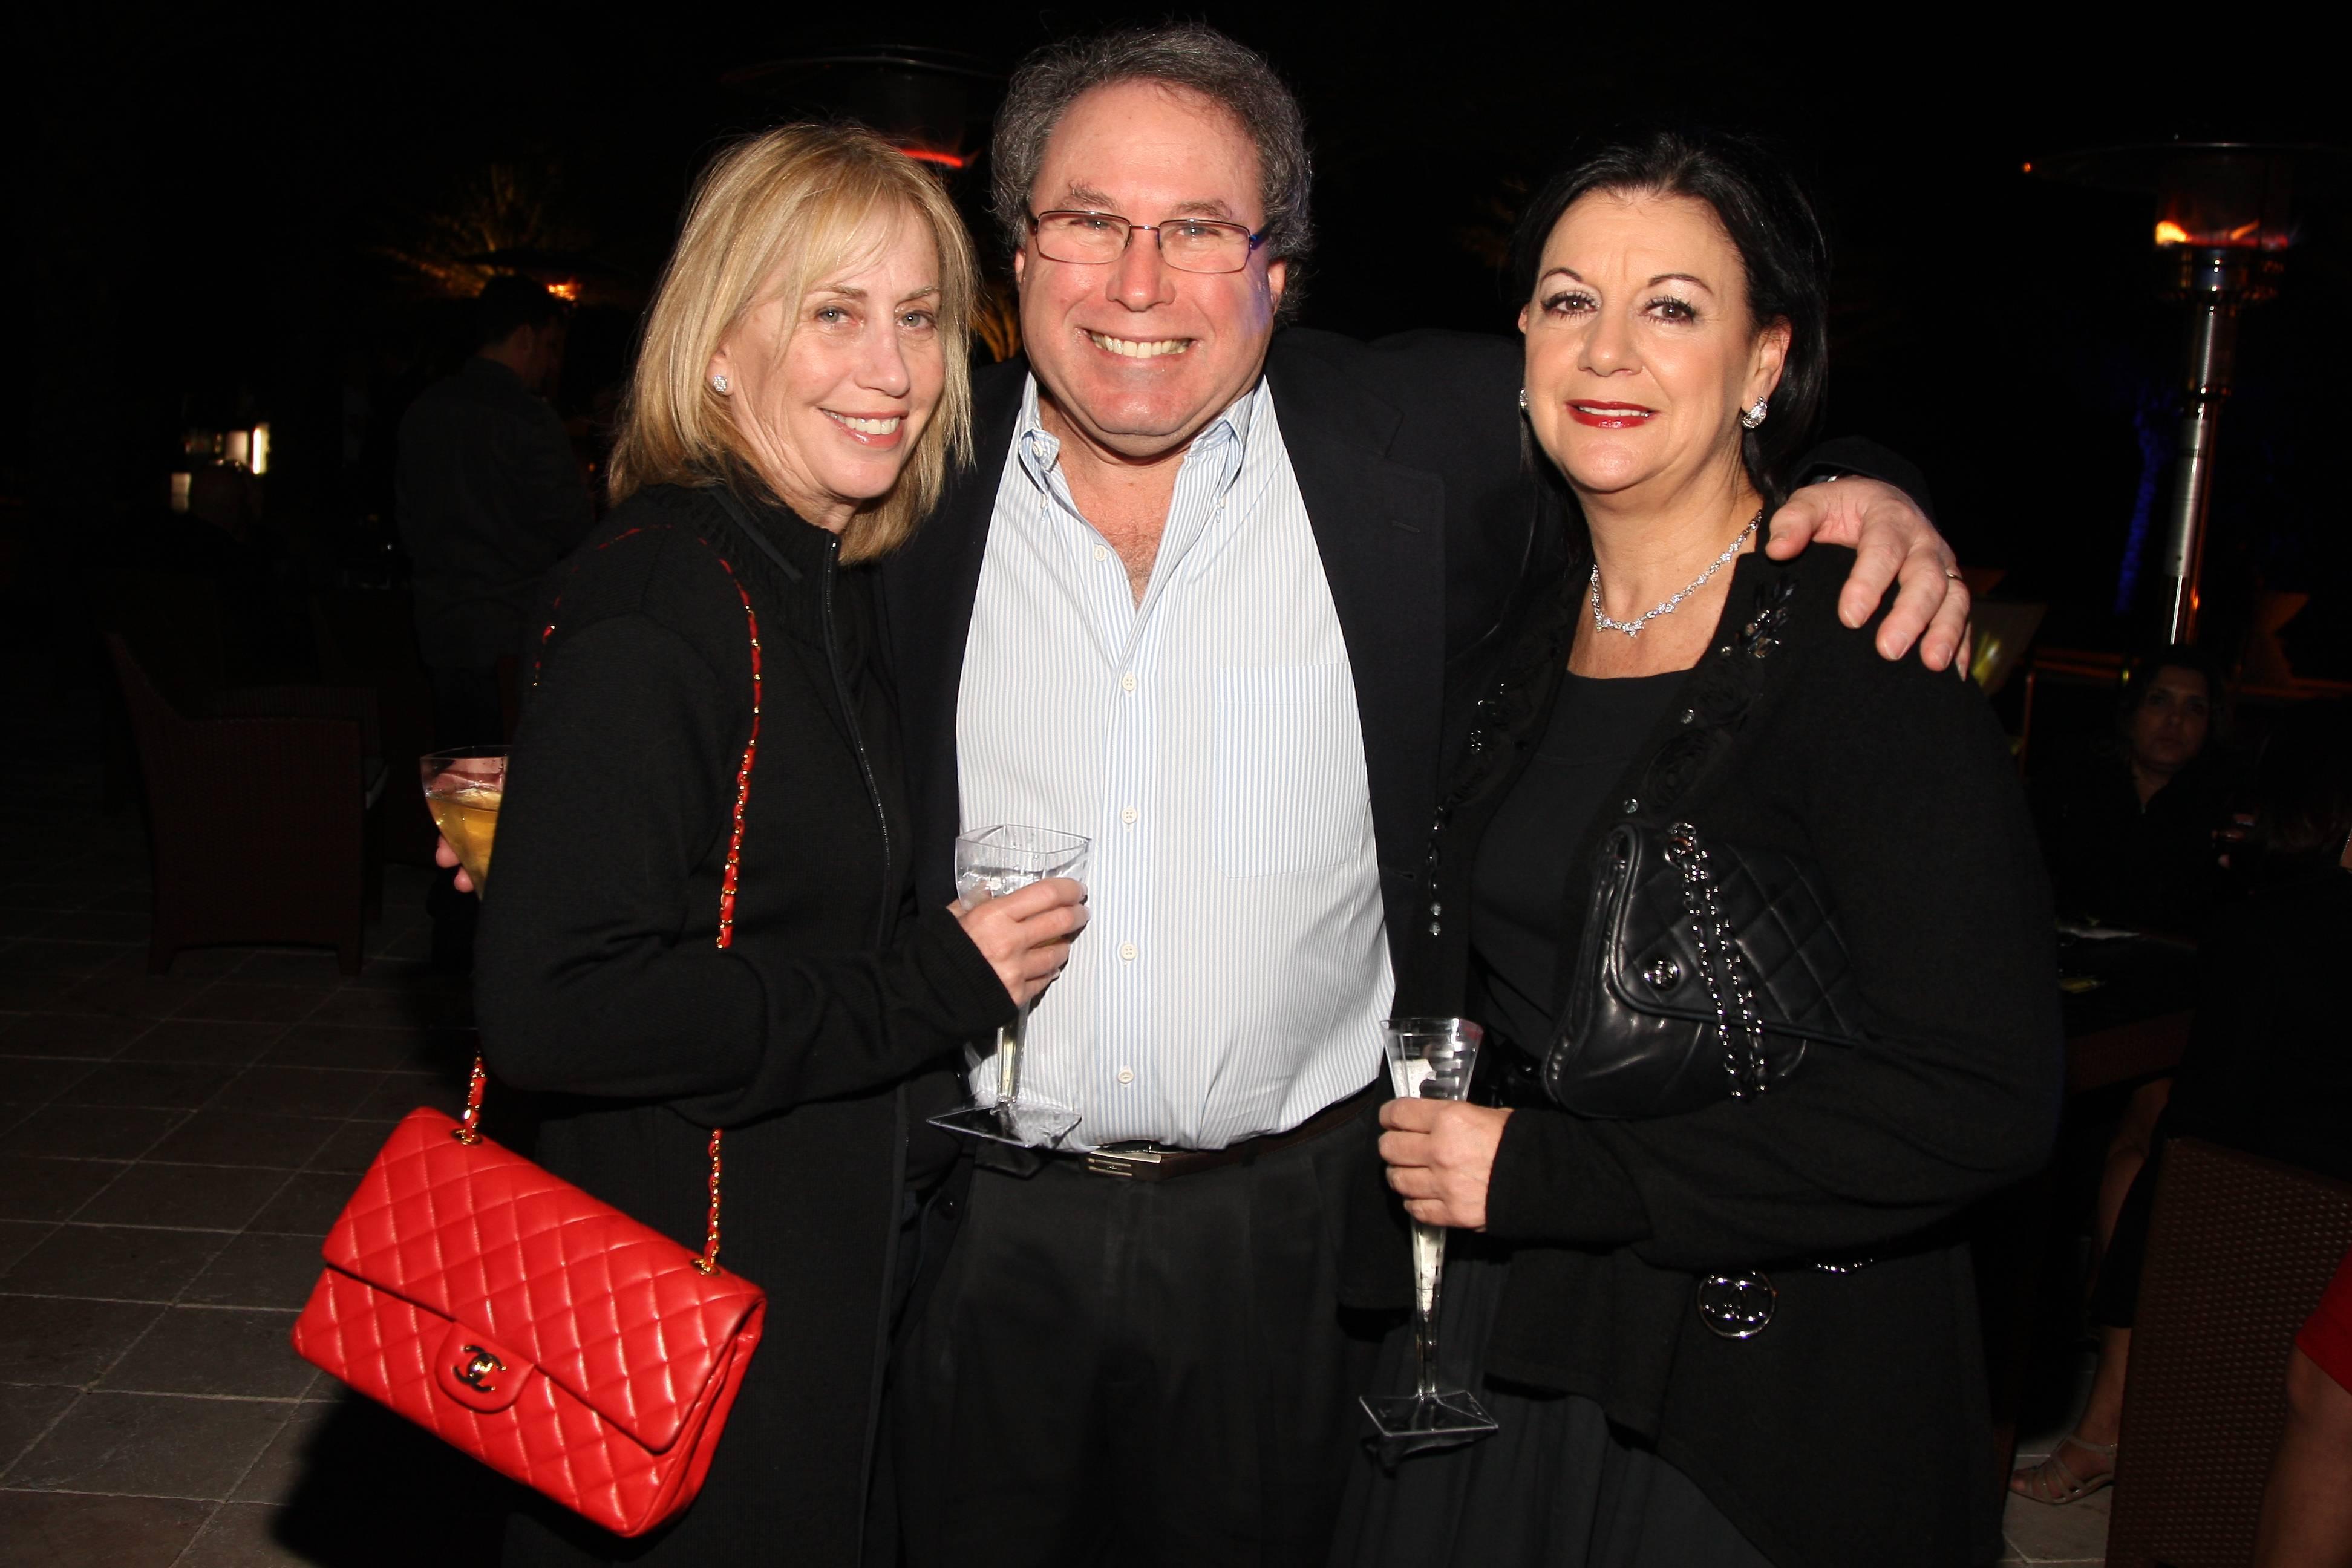 Cindy and Steven Dratch, Debbie Sroka